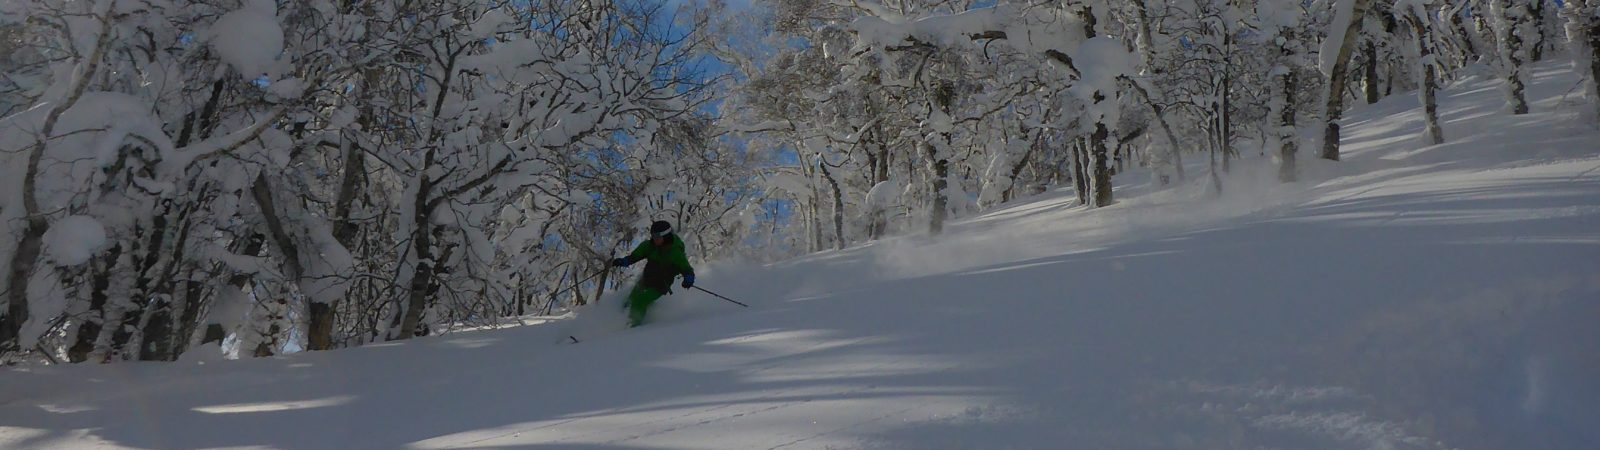 Hokkaido backcountry and ski touring